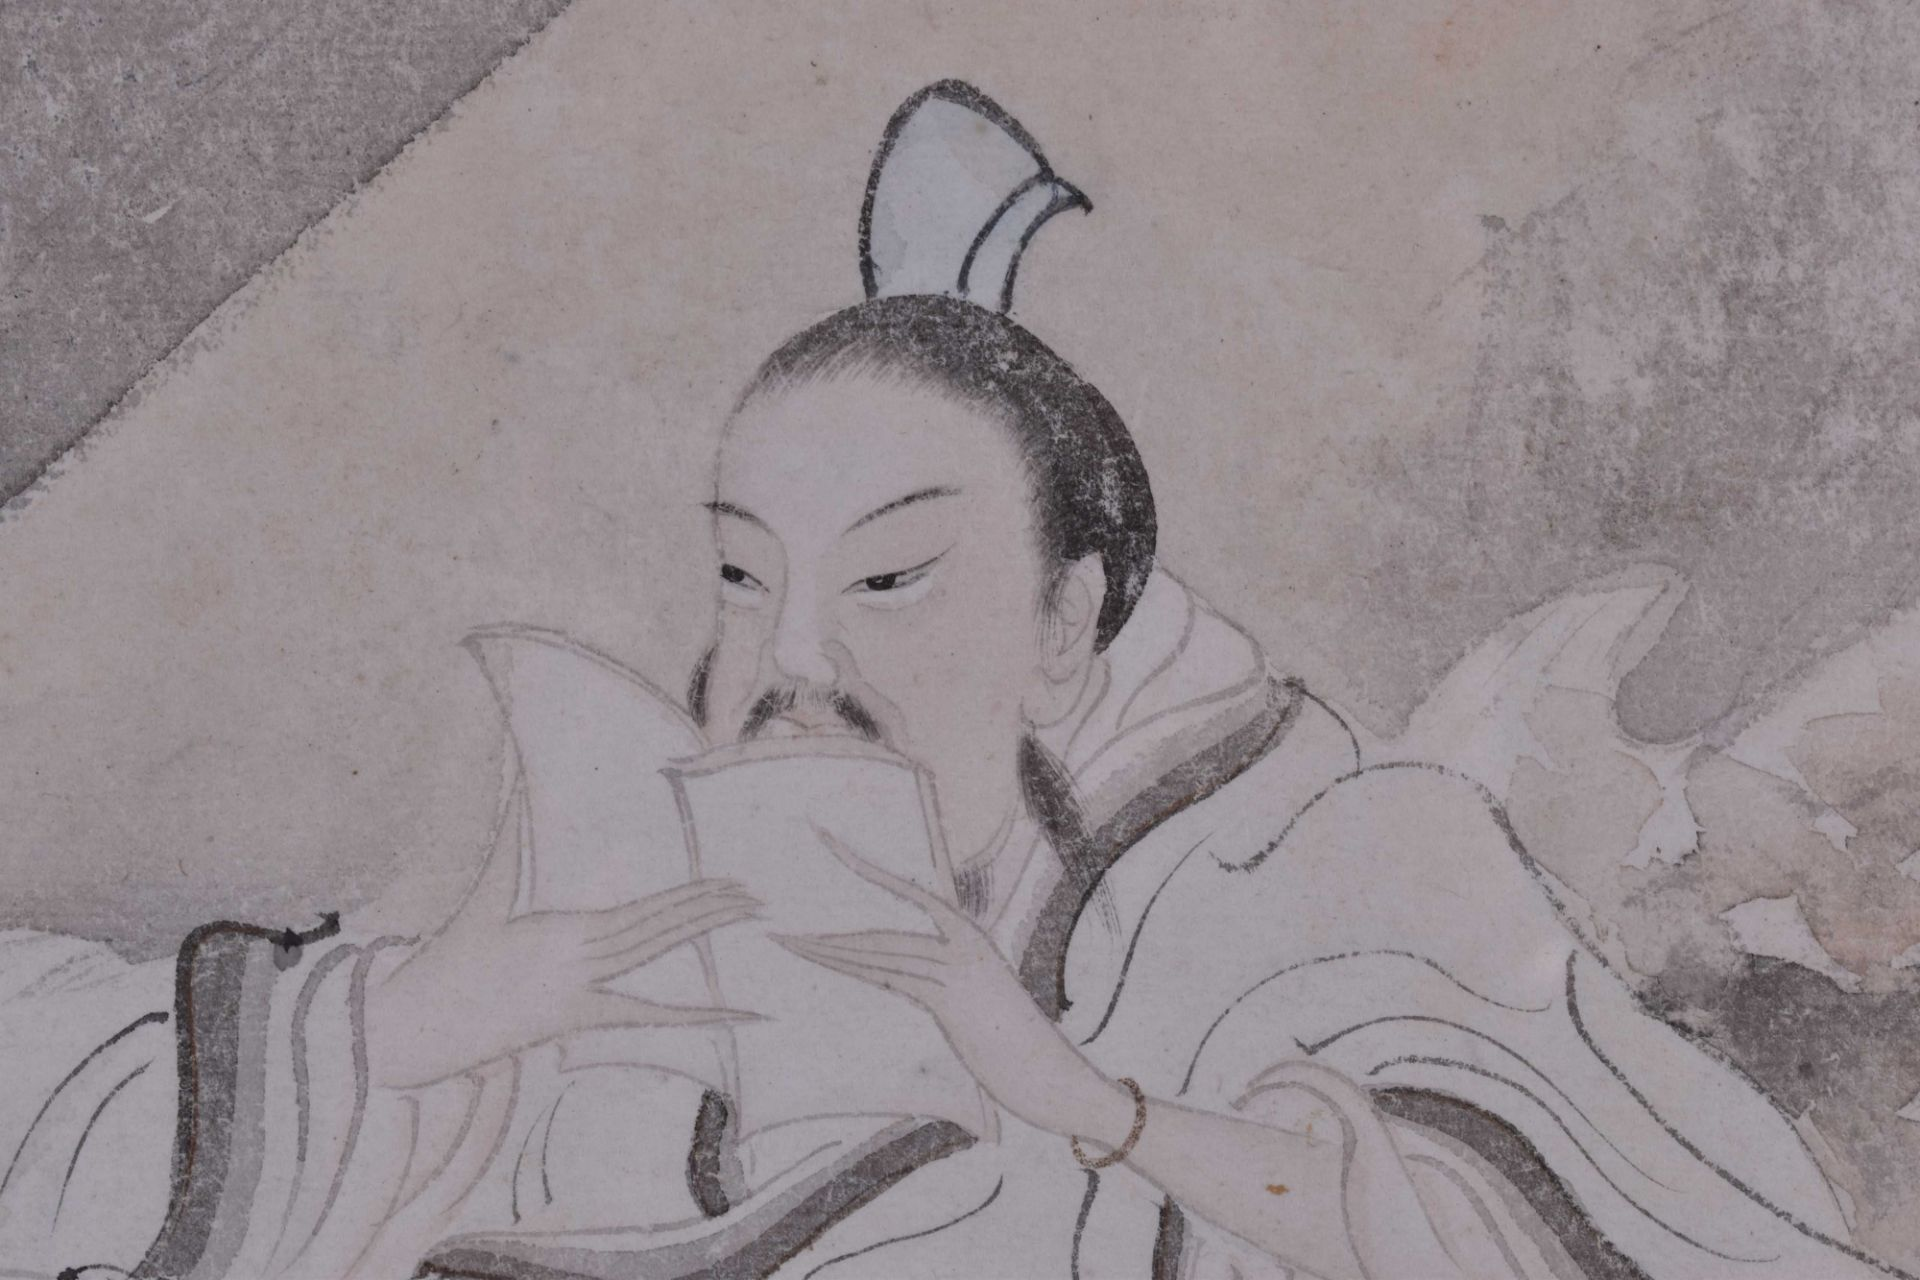 Zhang Zujiän Chinese artist of the 19th century - Image 3 of 6